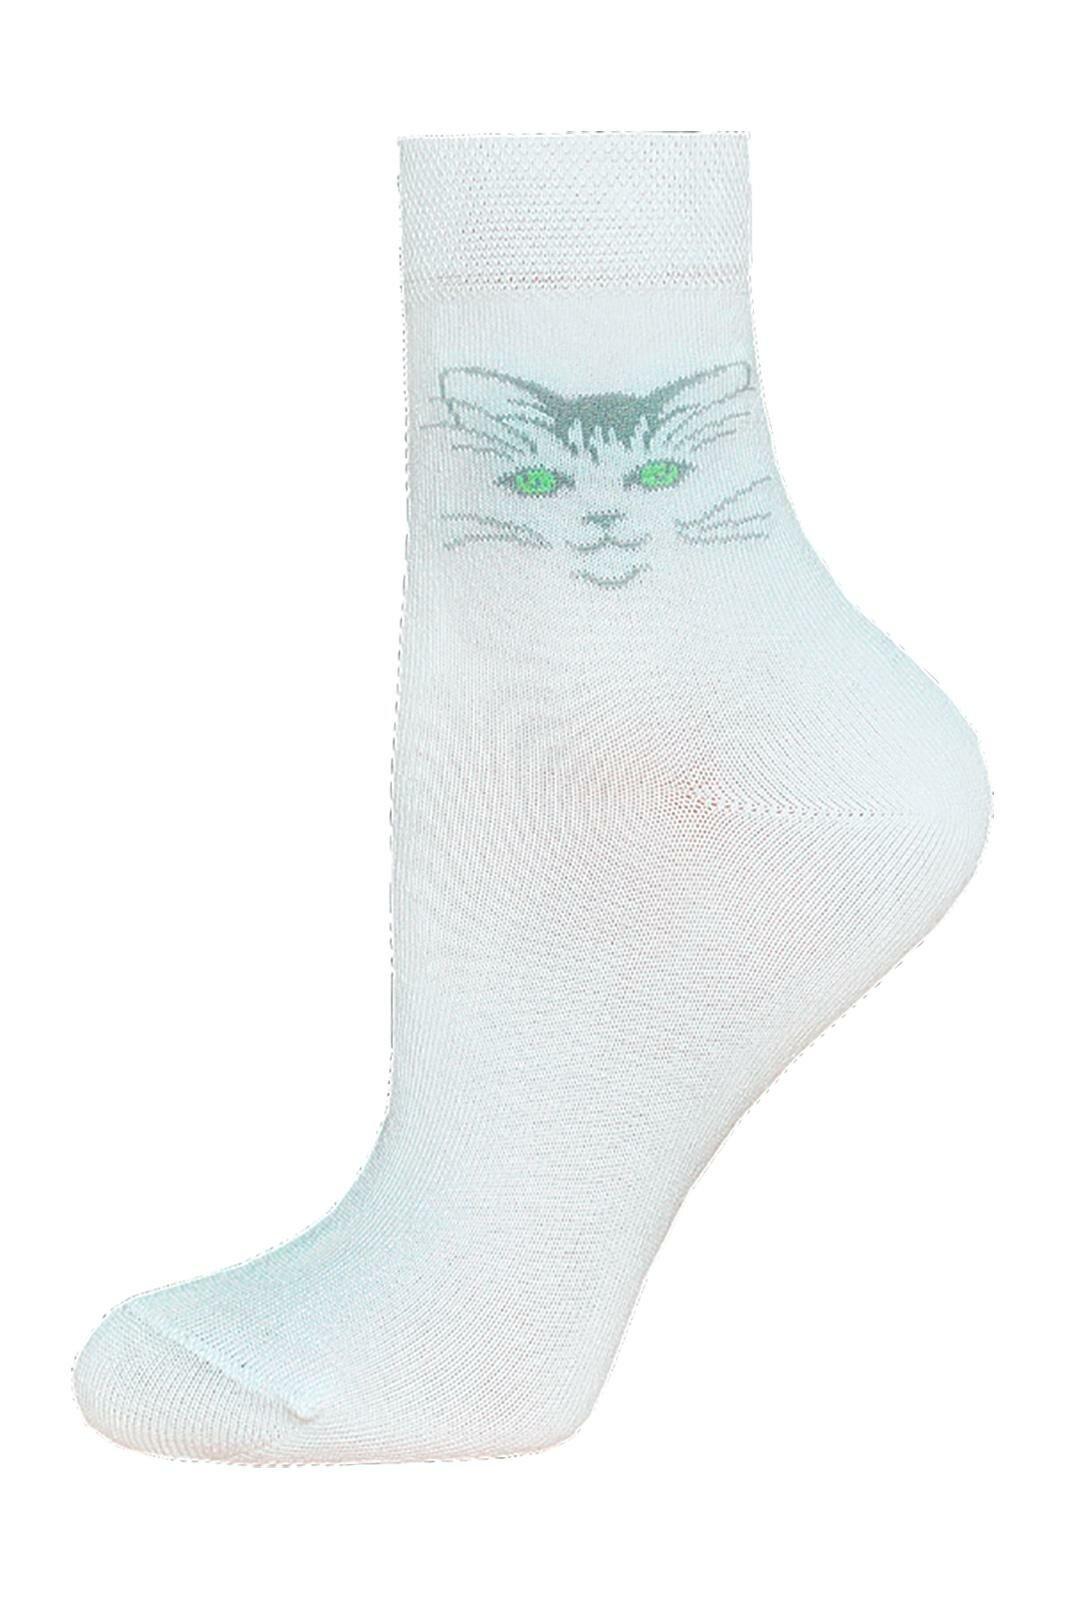 Носки Брестский Чулочный Комбинат 3081 белый 047